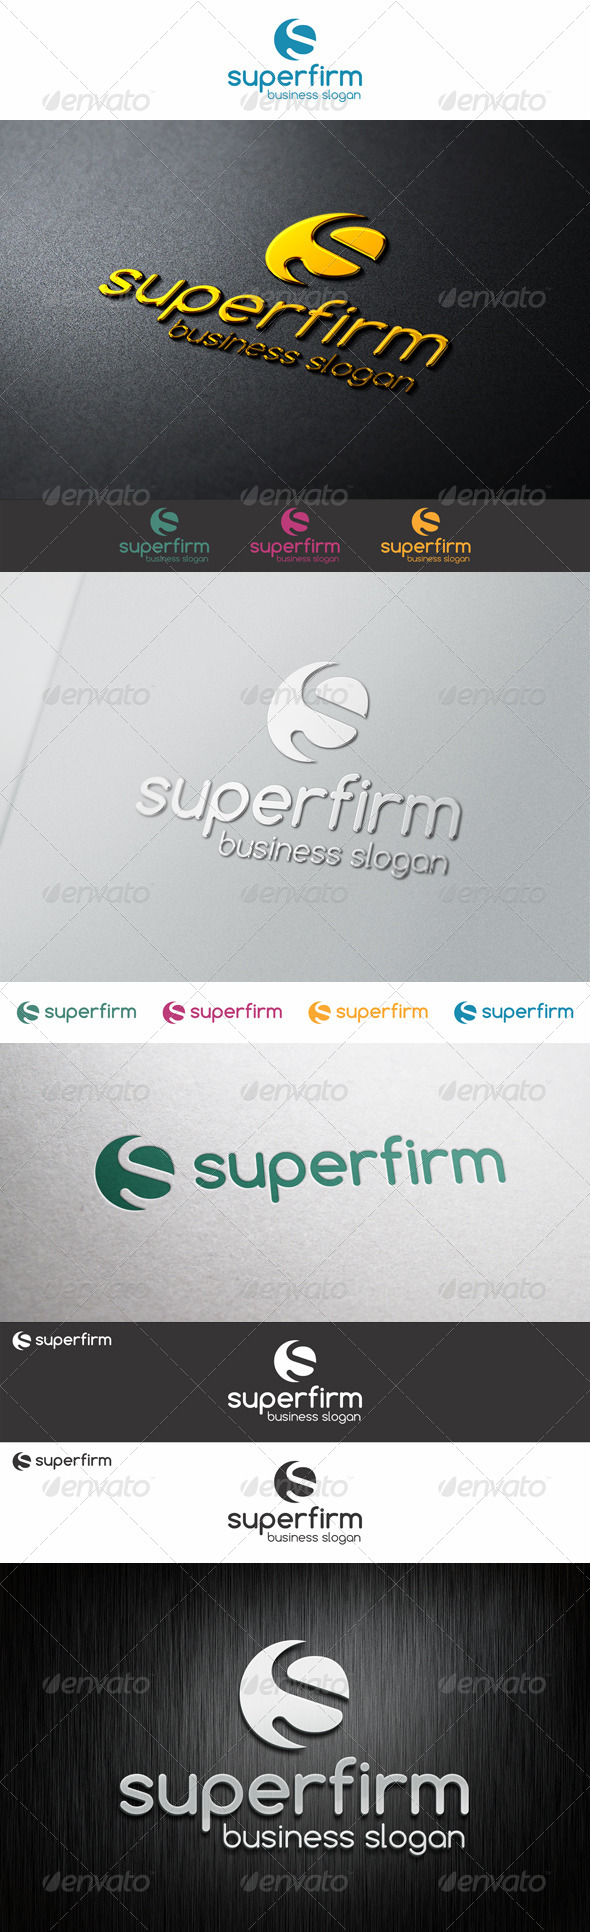 S Logo Shape - Super Firm